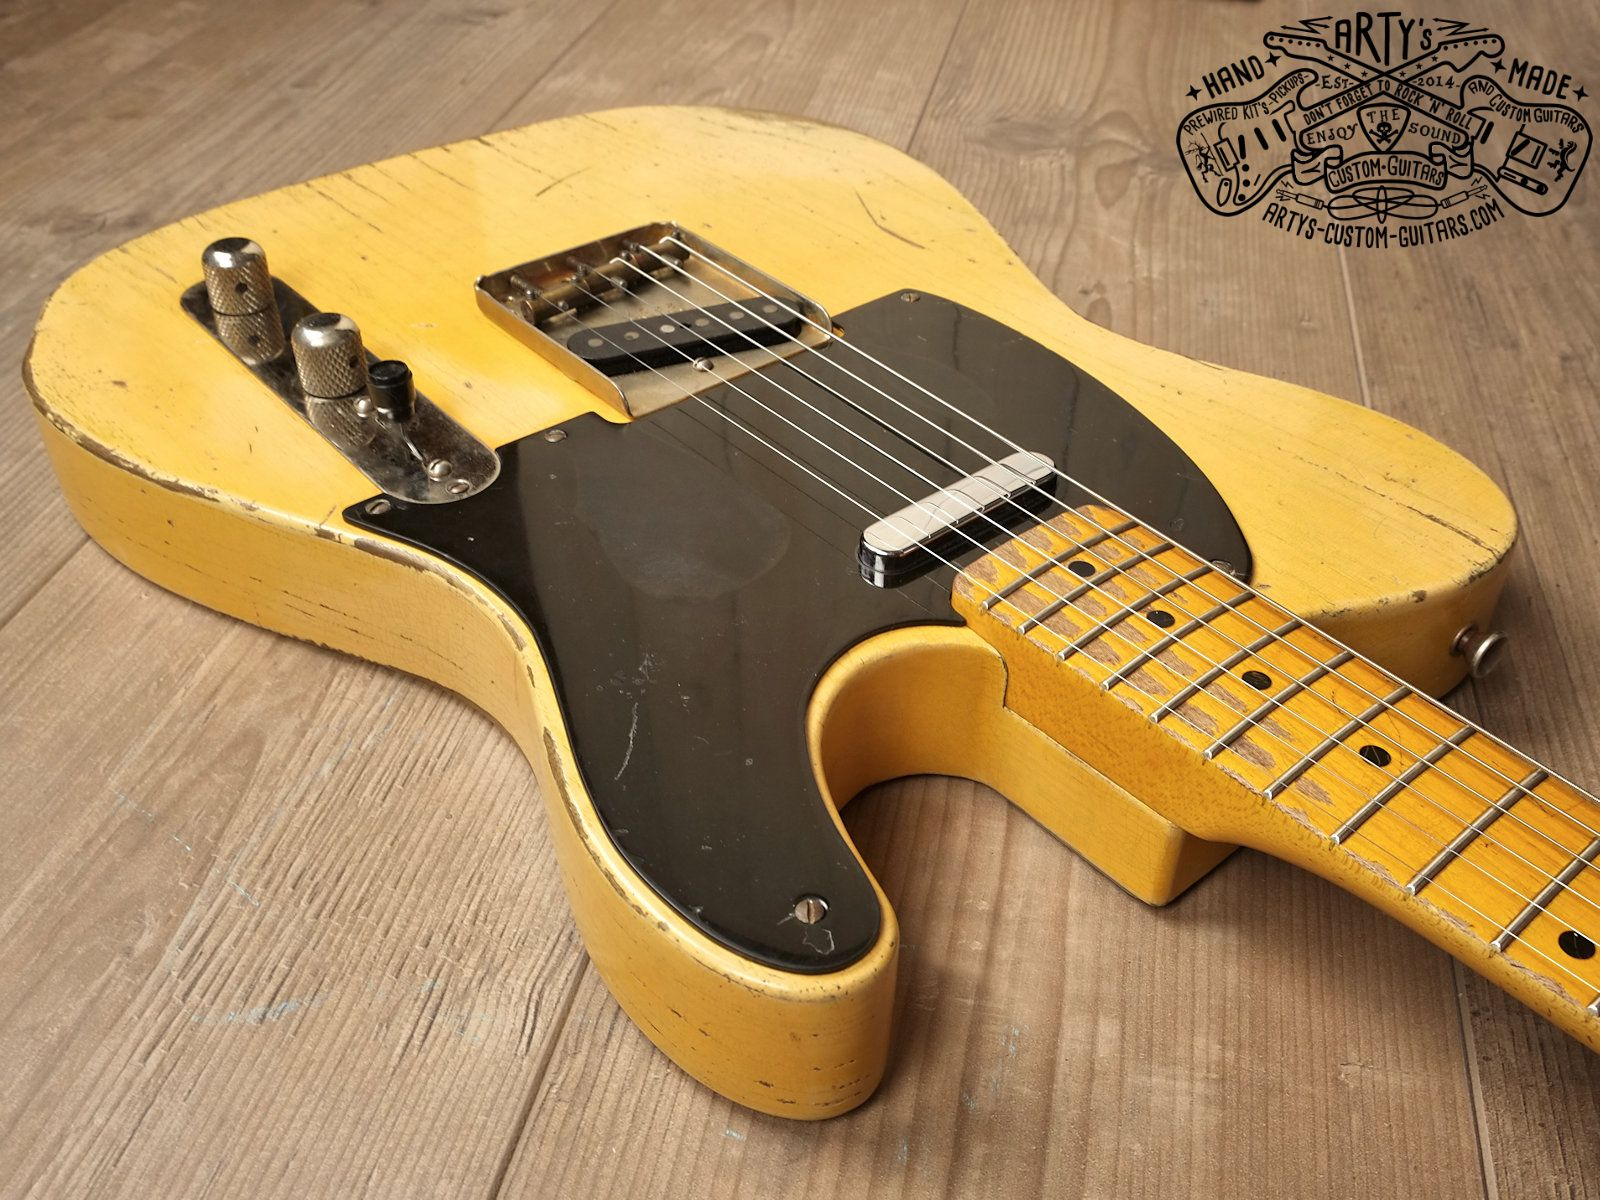 hight resolution of broadcaster butterscotch blonde telecaster heavy relic tele maple neck swamp ash body bakelite pickguard aged nitro finish arty s custom guitars